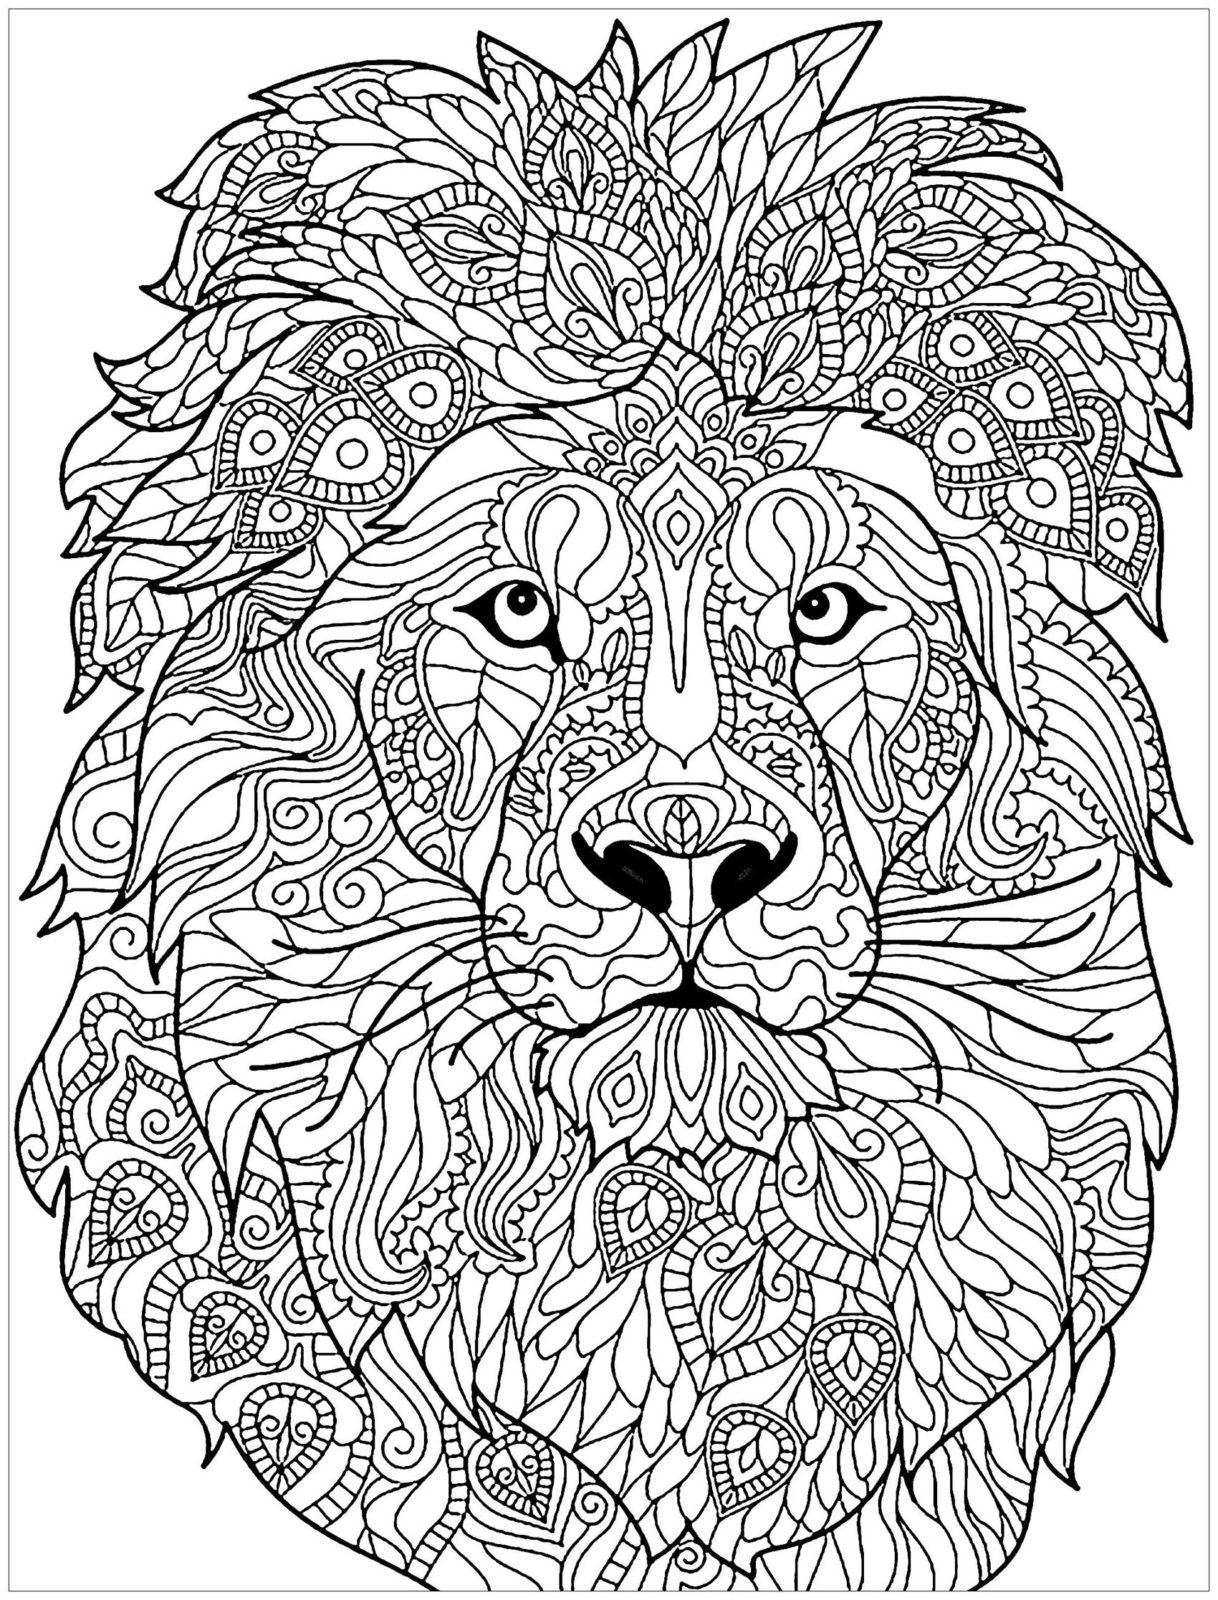 раскраска лев антистресс 2